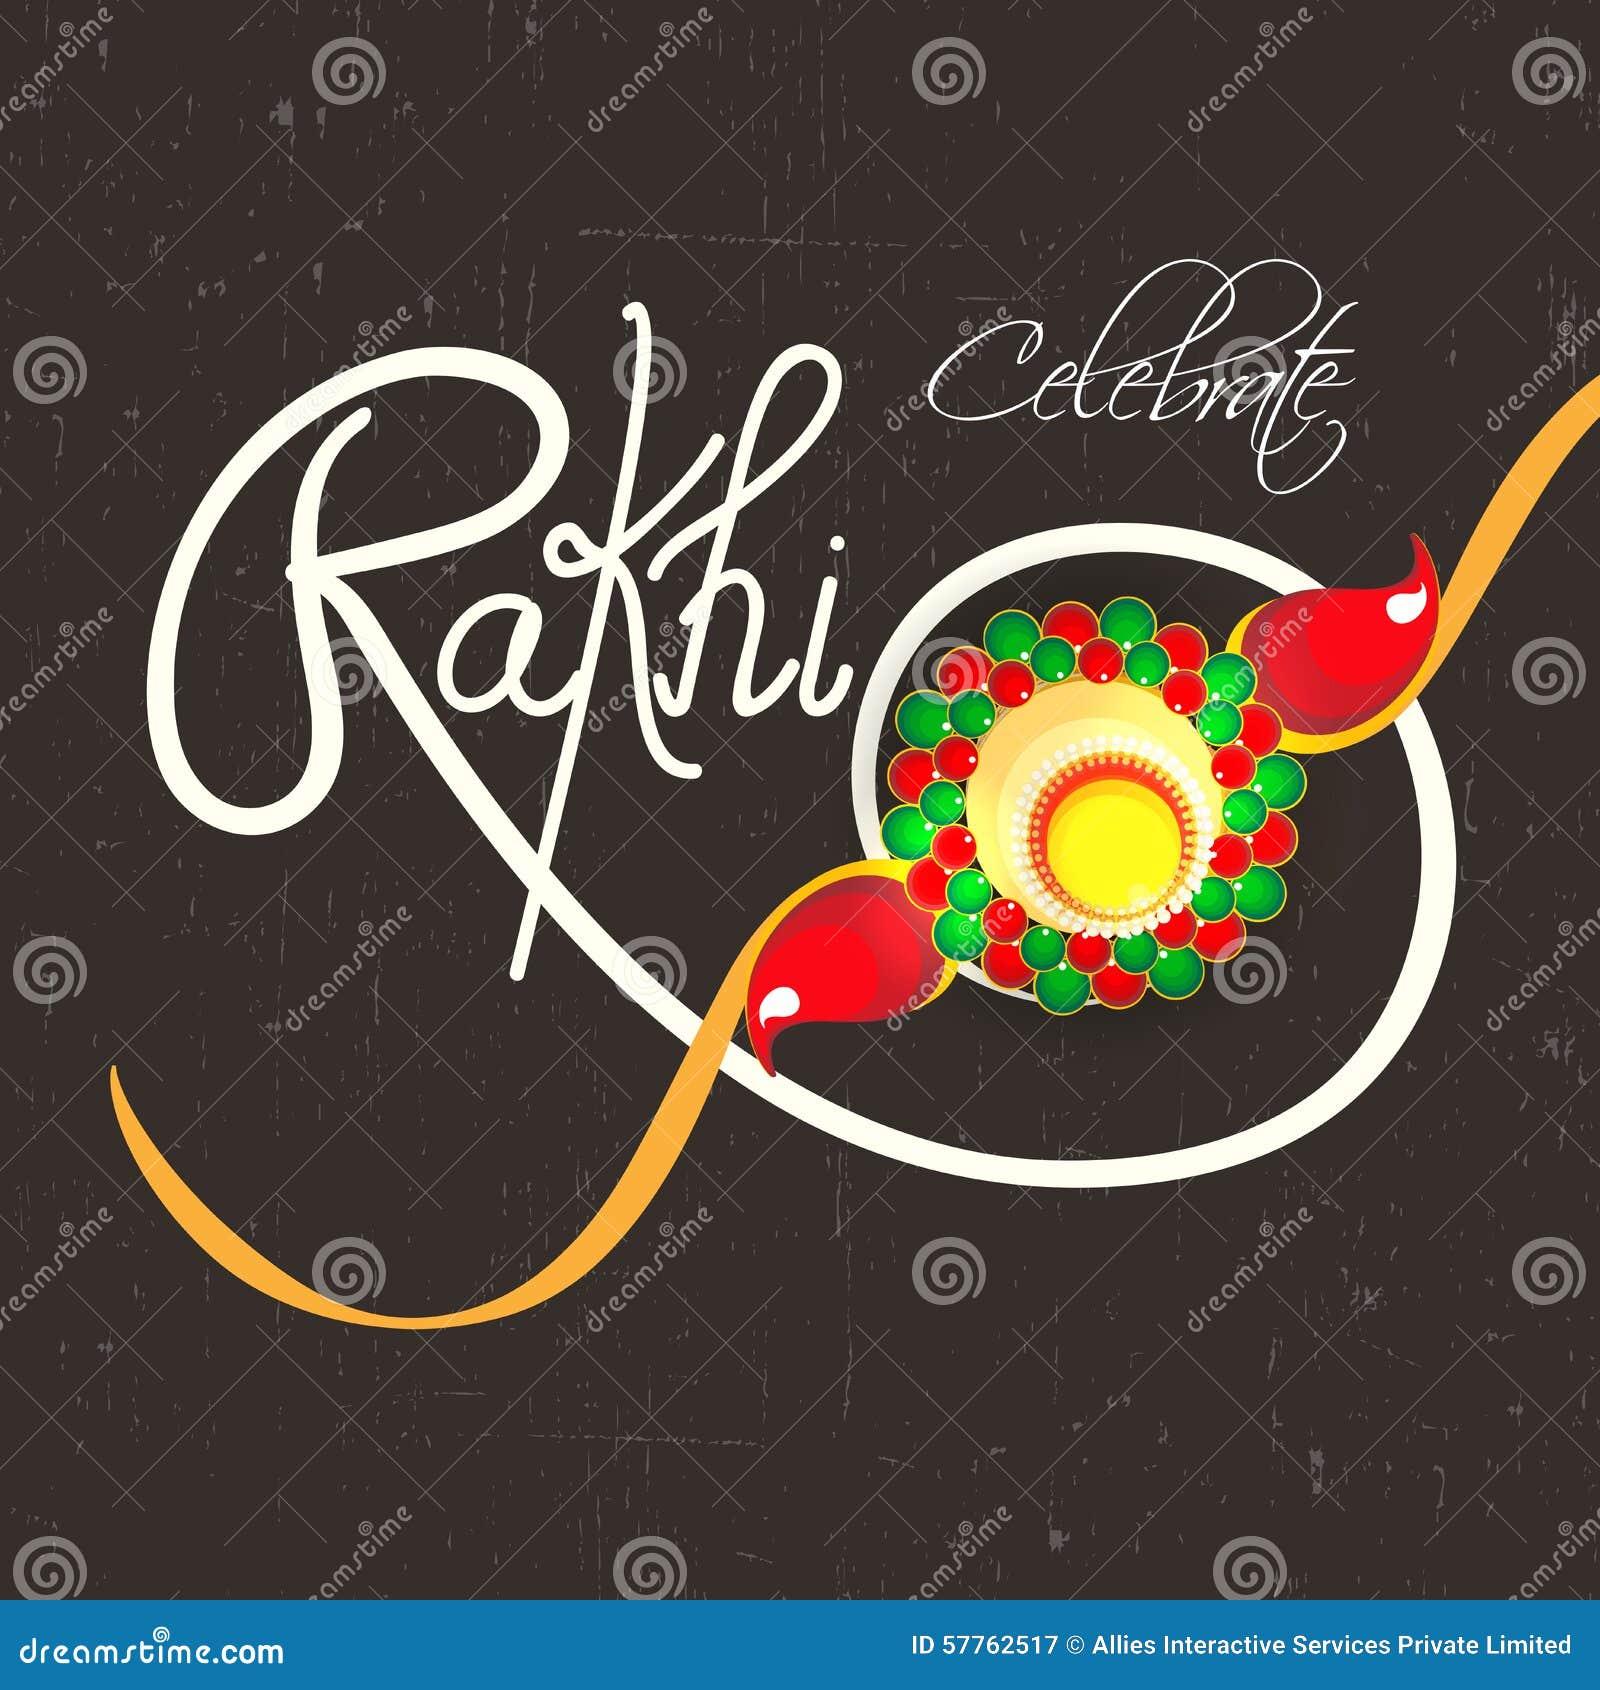 Rakhi Festival Quotes Brother: Beautiful Rakhi For Raksha Bandhan Celebration. Stock